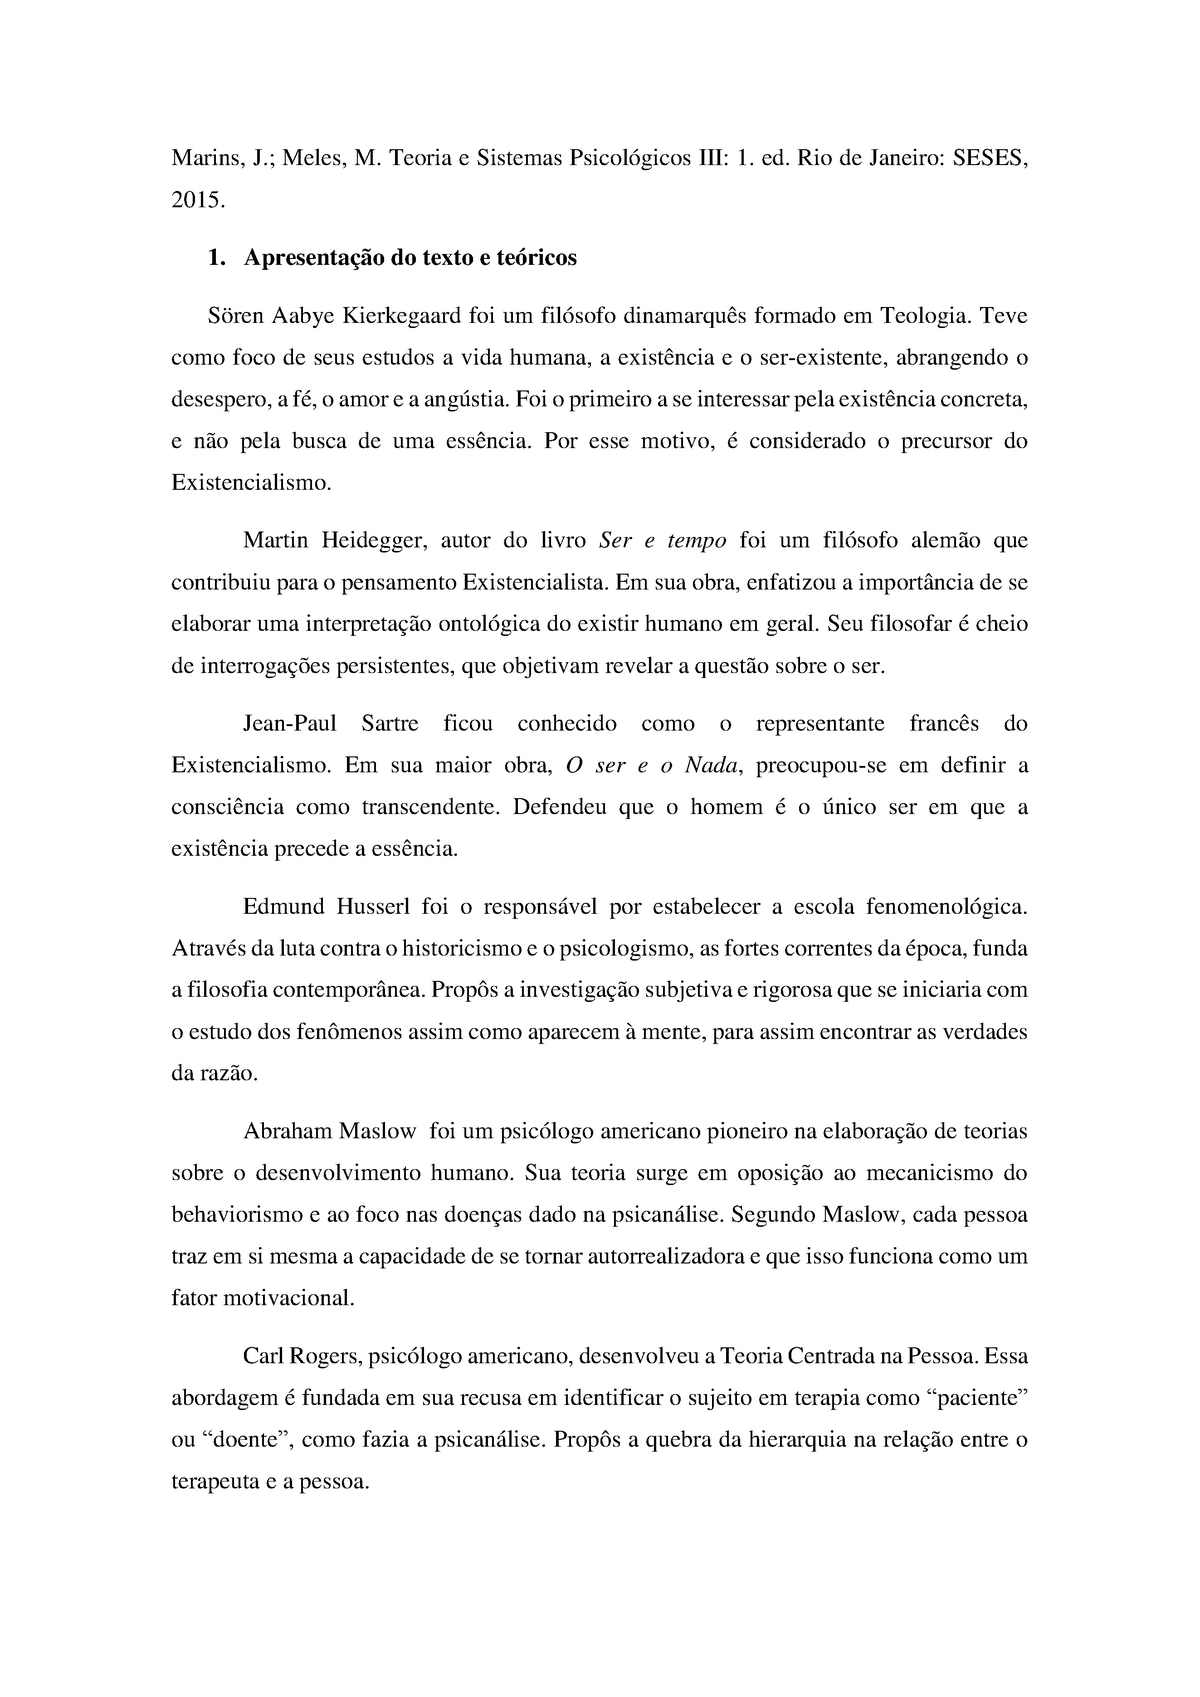 Resenha Existencialismo Fenomenologia E Humanismo Studocu